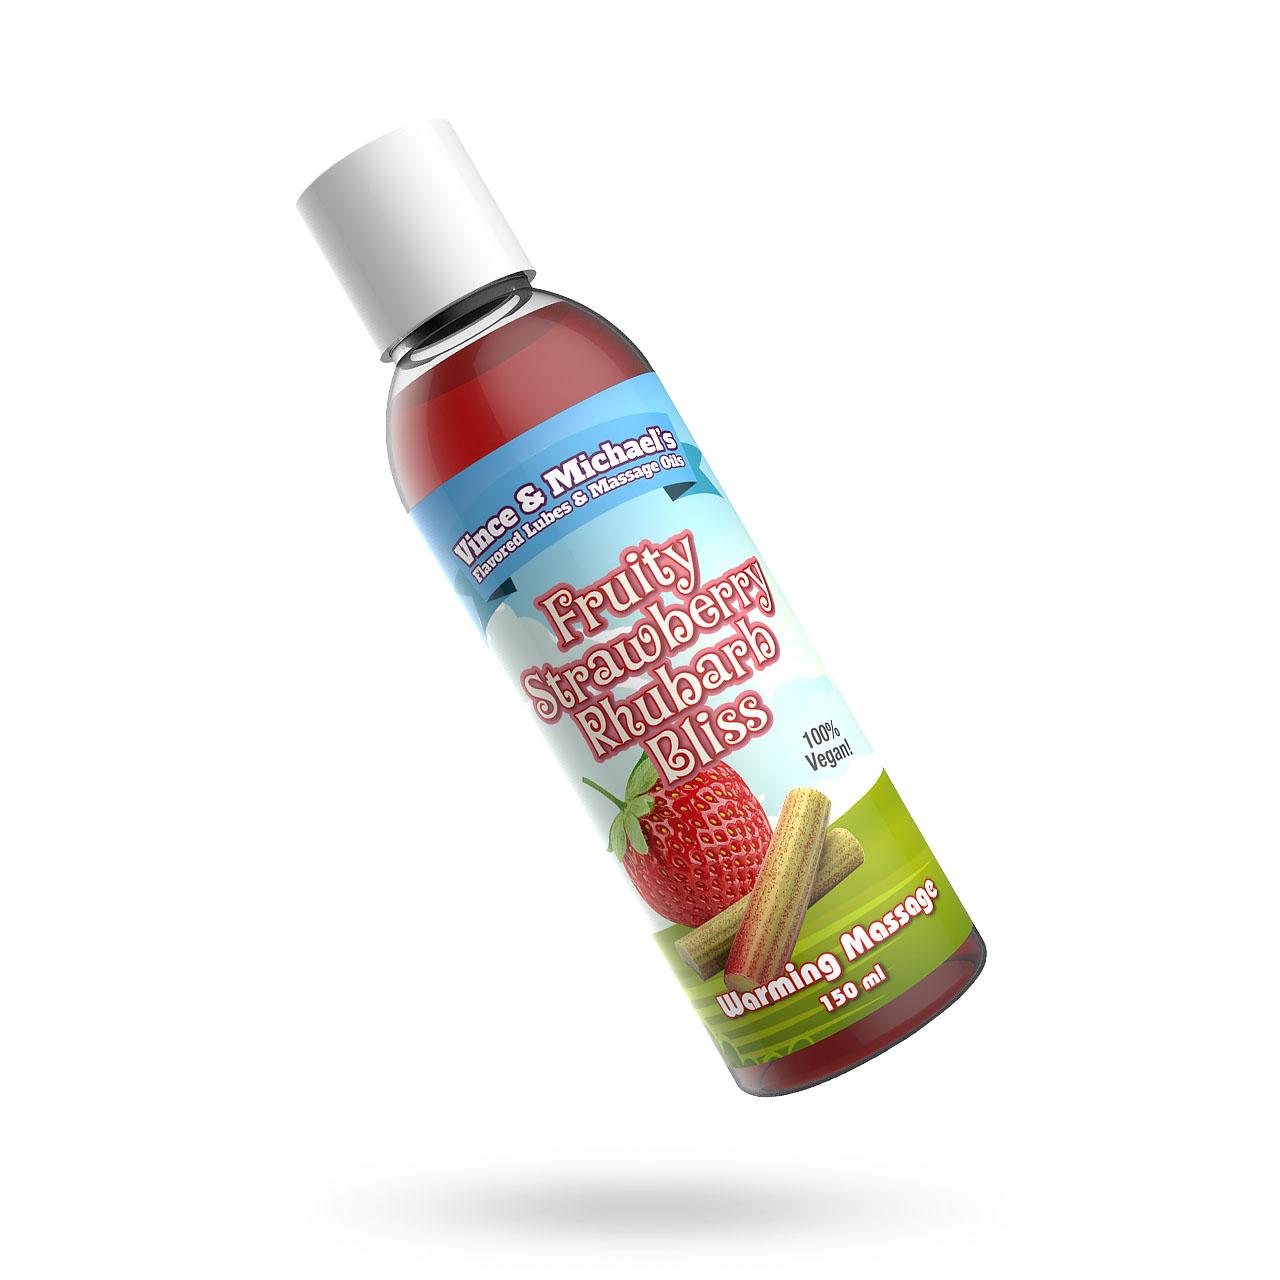 Fruity Strawberry Rhubarb Bliss - Smaksatt massageolja